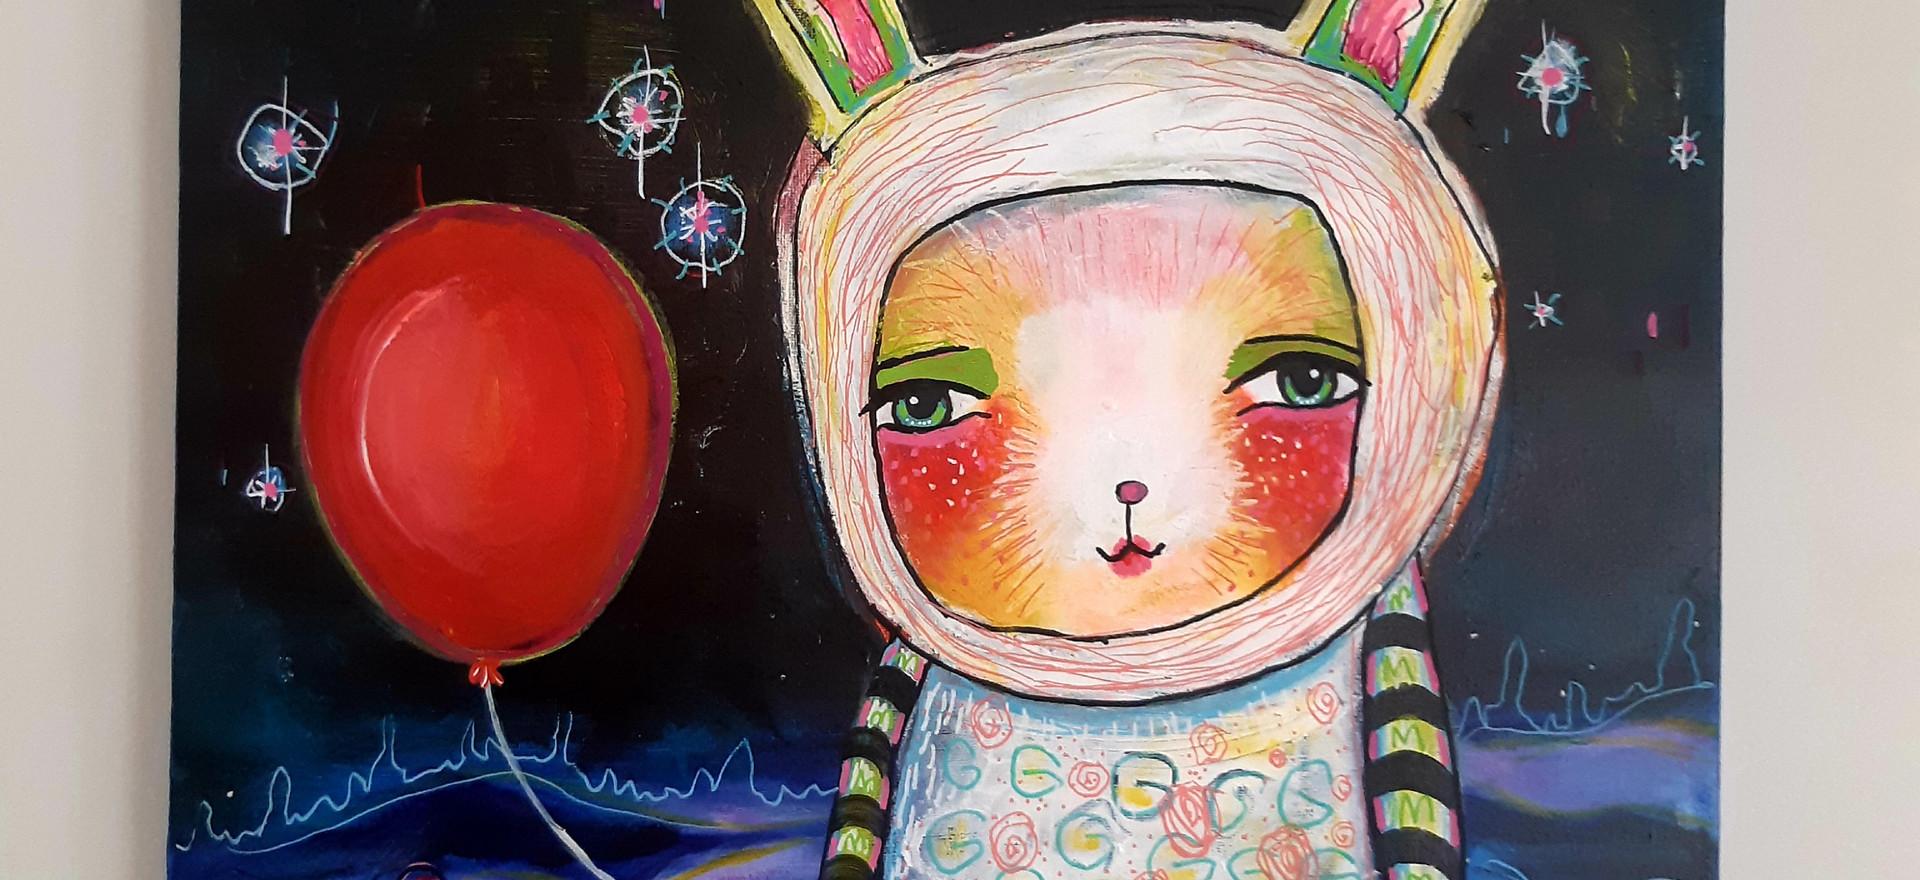 Bunny Baloon by Gail Gamacho